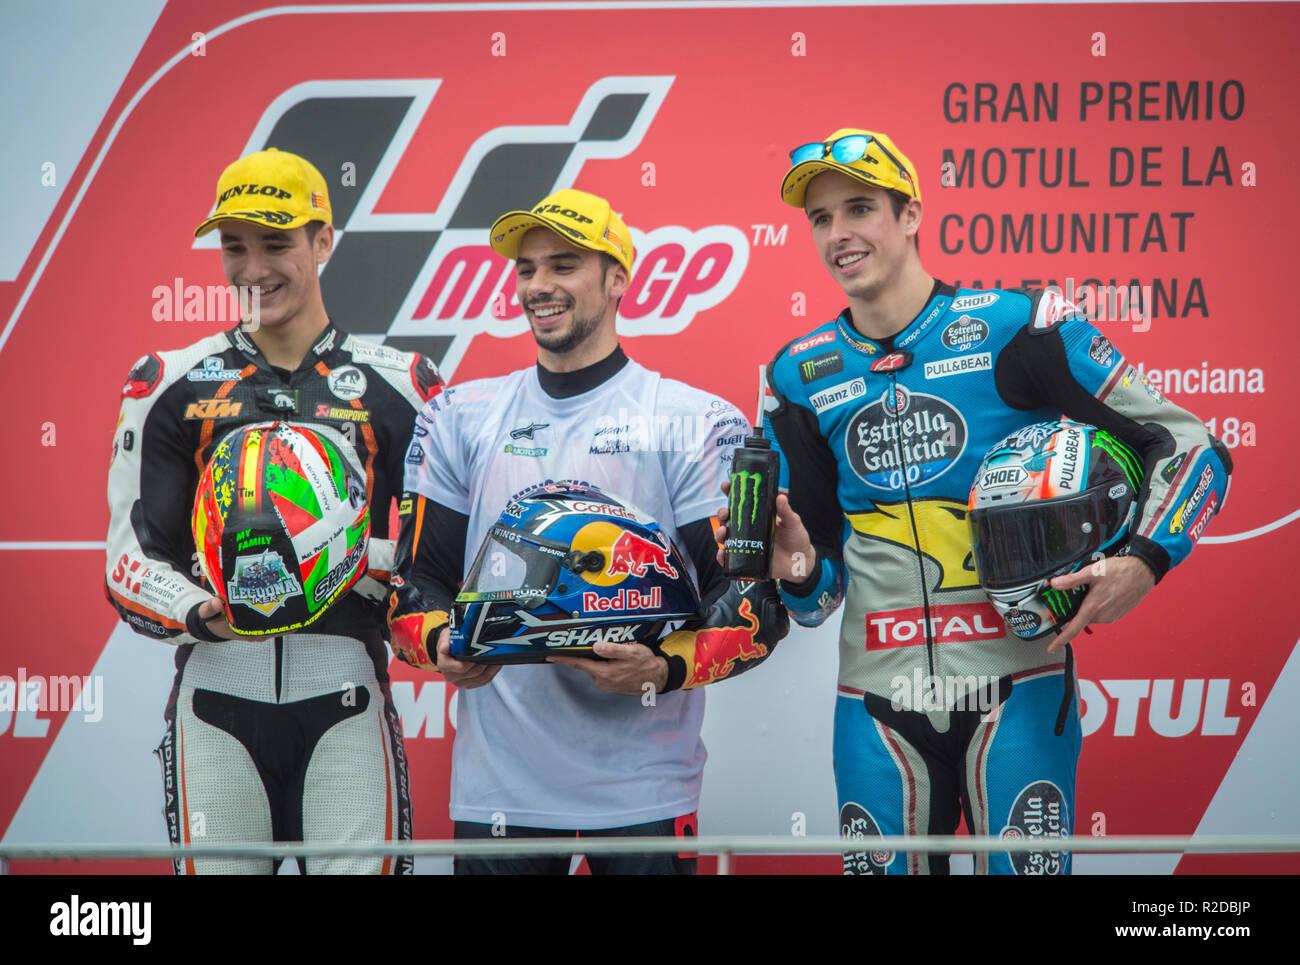 Cheste, Valencia, Spain. 18th Nov, 2018. GP Comunitat Valenciana Moto GP.Oliveira, Lecuaona and Alex Marquez in podium after moto 2 race. Credit: rosdemora/Alamy Live News - Stock Image